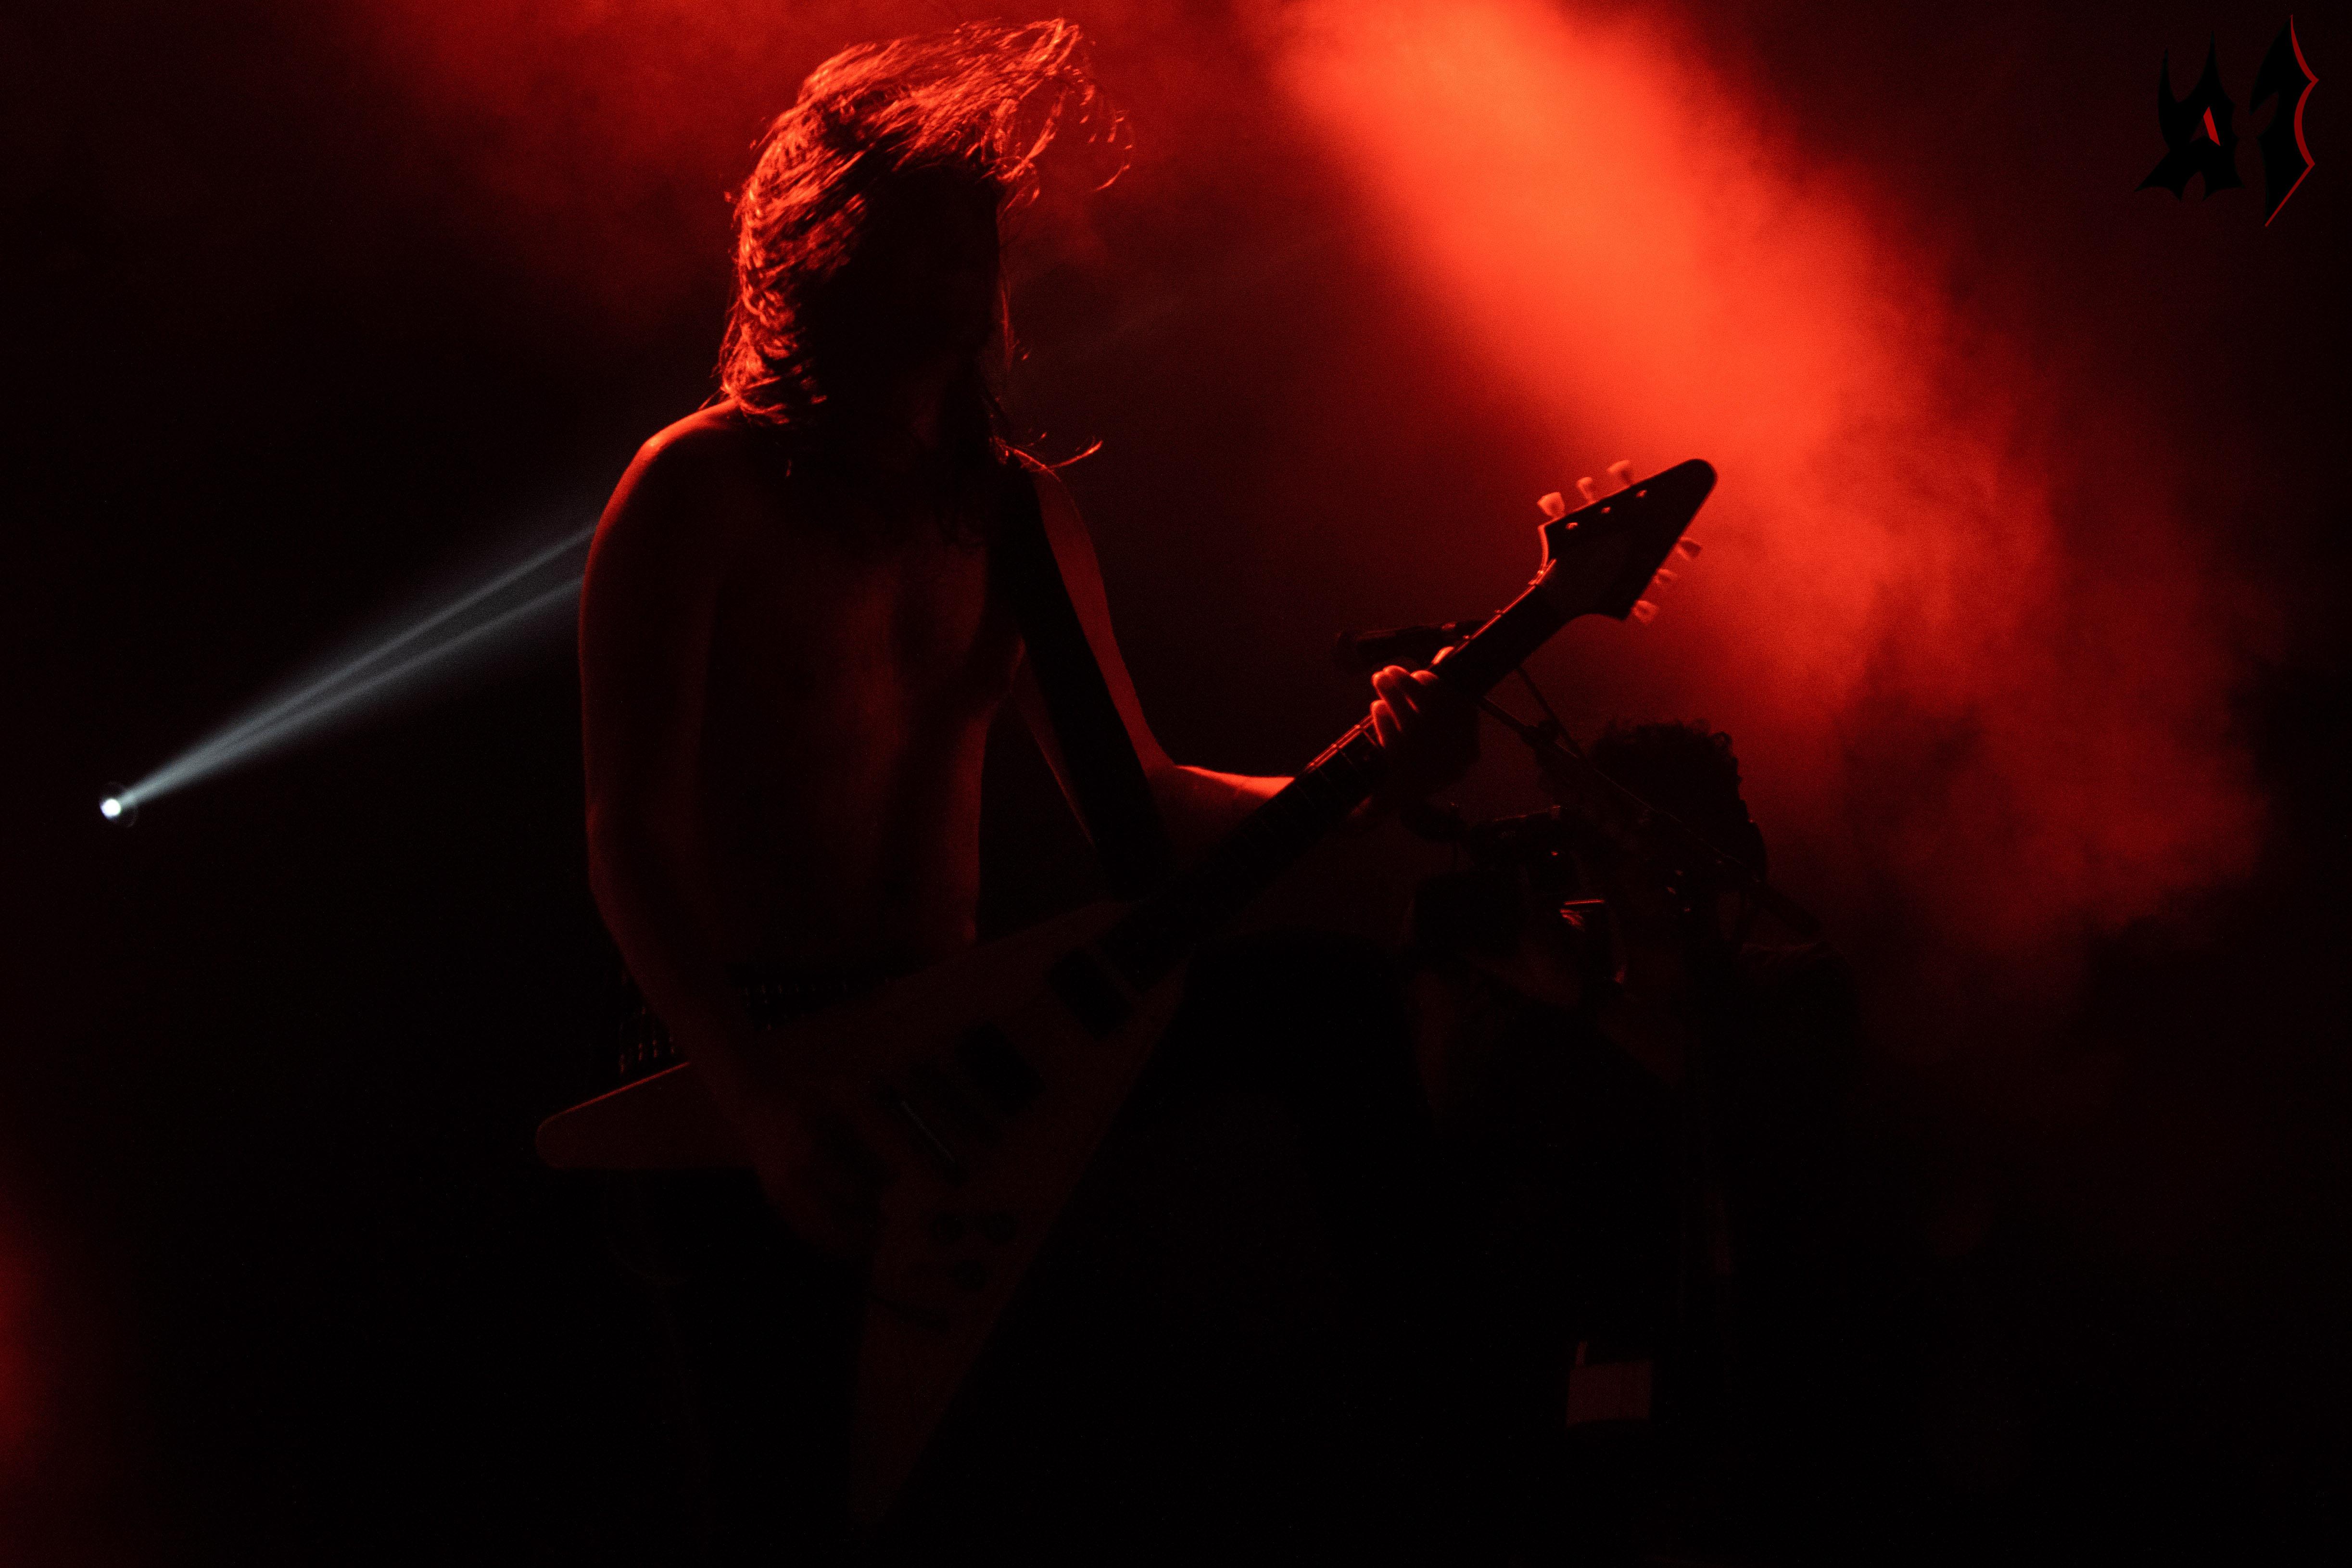 Hellfest - Bloodbath - 9